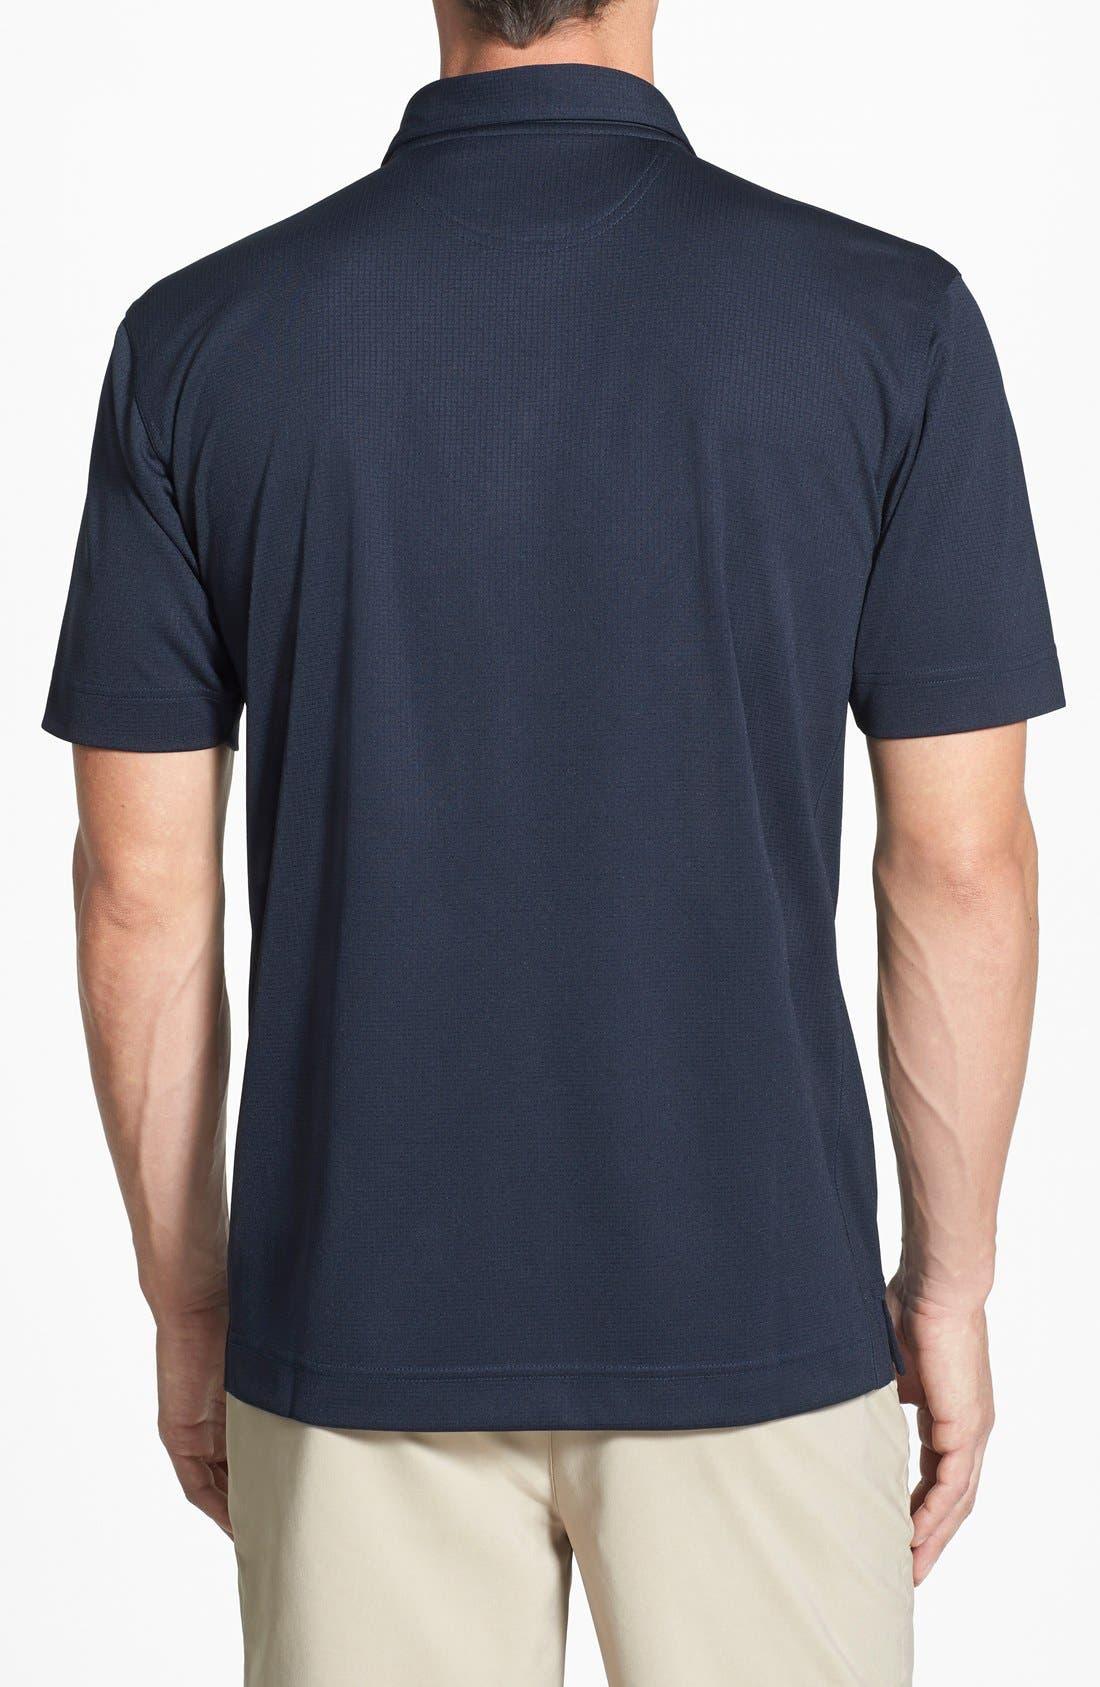 Los Angeles Rams - Genre DryTec Moisture Wicking Polo,                             Alternate thumbnail 2, color,                             Navy Blue